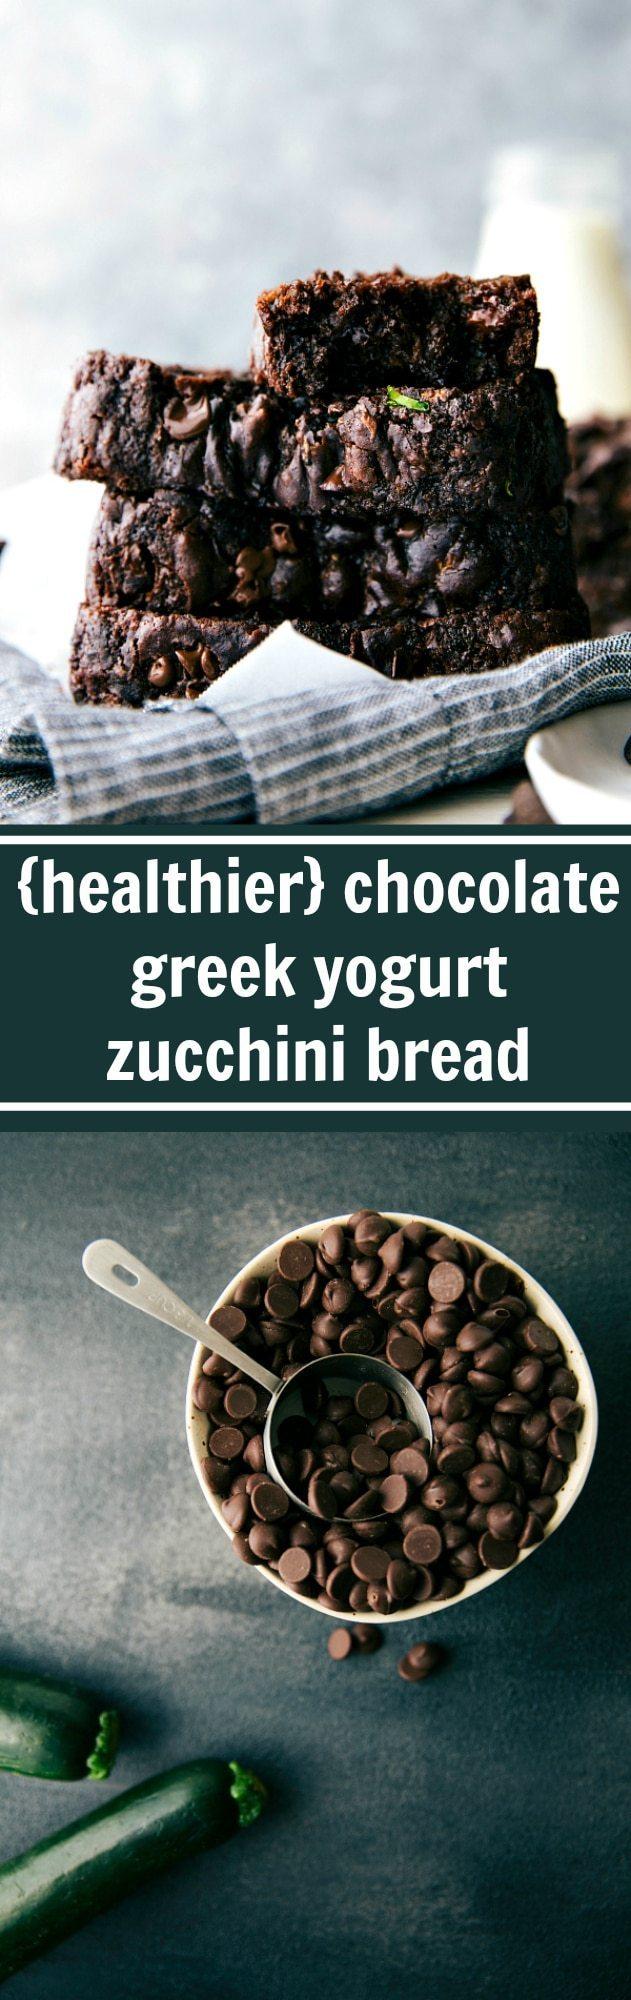 Chocolate Greek Yogurt Zucchini Bread made with healthier ingredients and lower sugar!